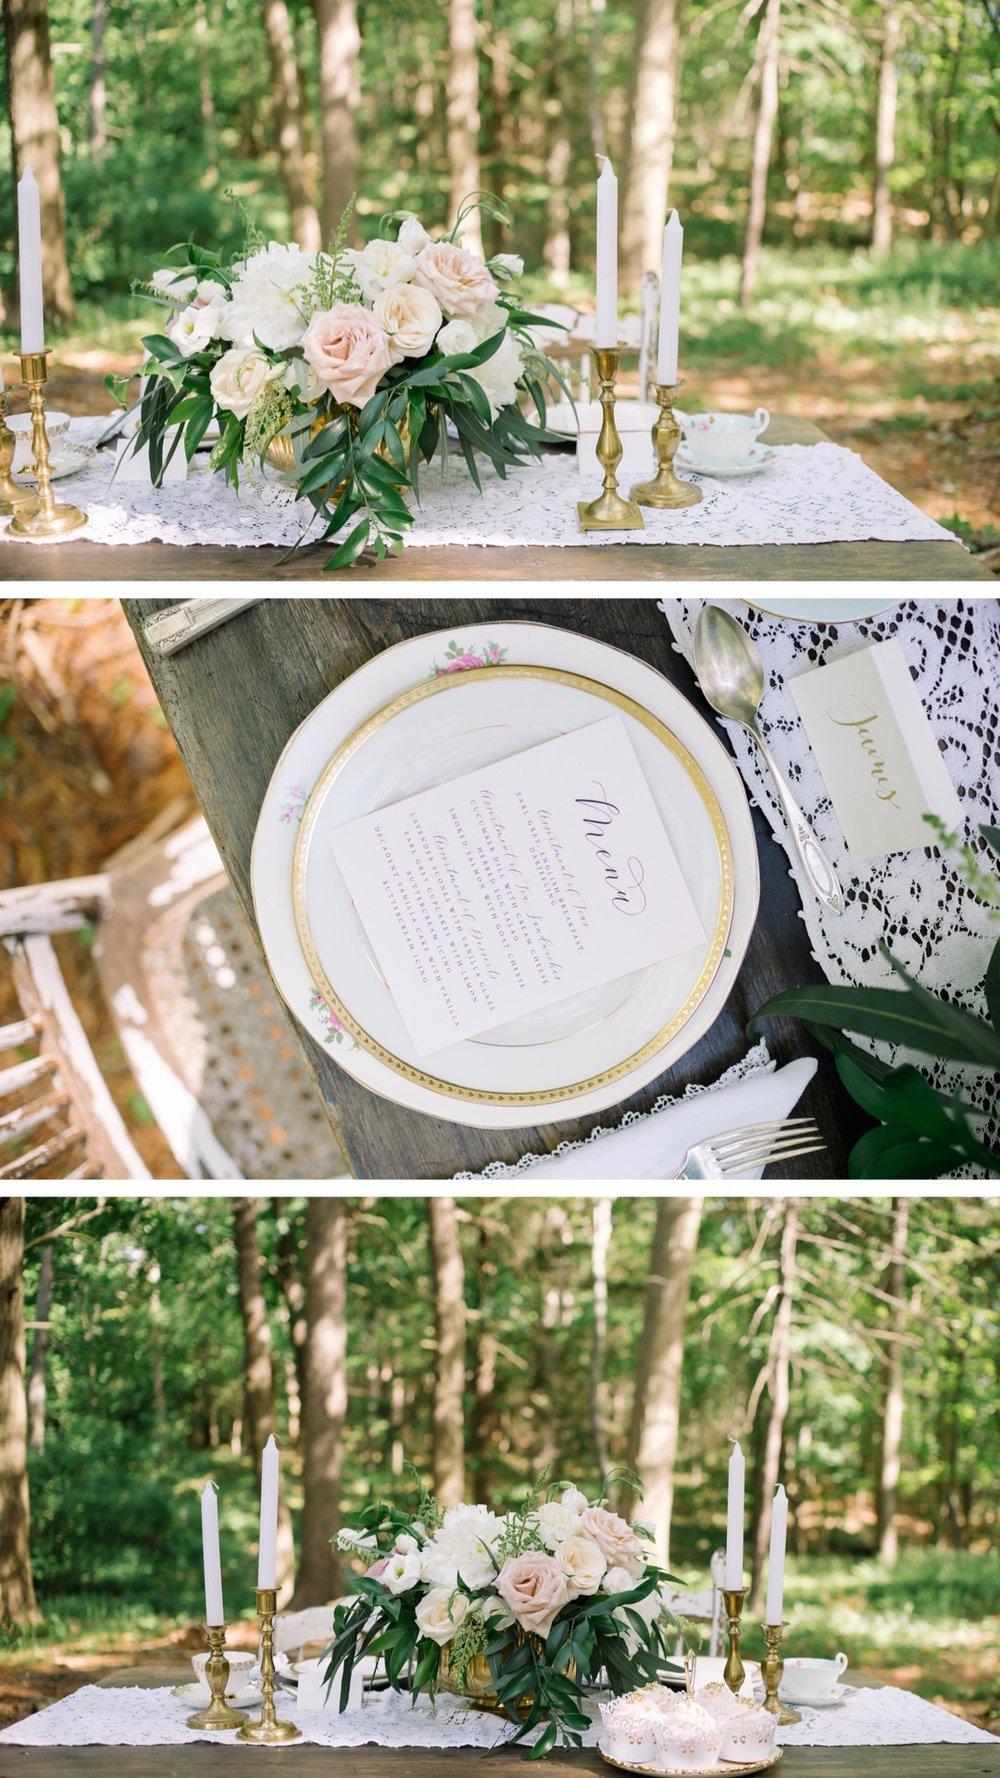 Halifax Wedding Photographer Styled Shoot - Gray Weddings & Events - Sinead Dubeau Photography 08